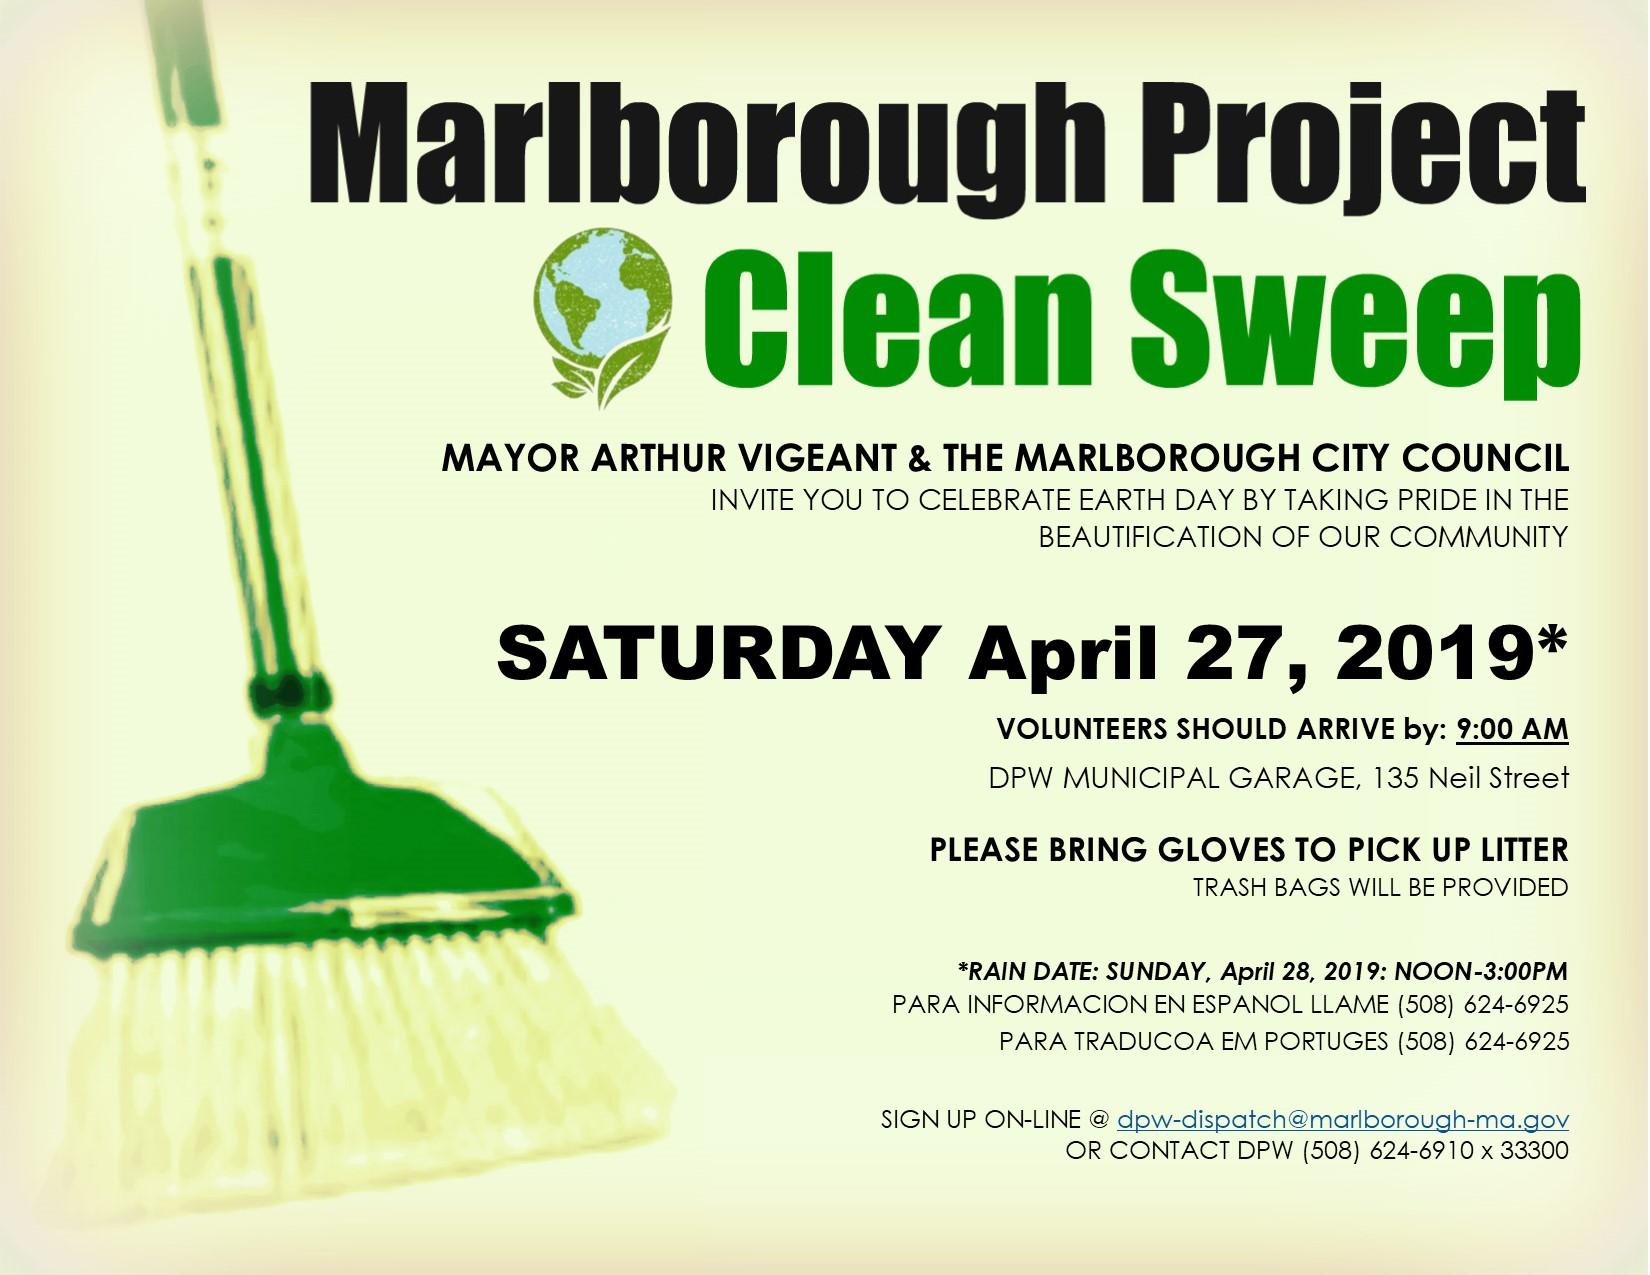 Marlborough Project Clean Sweep